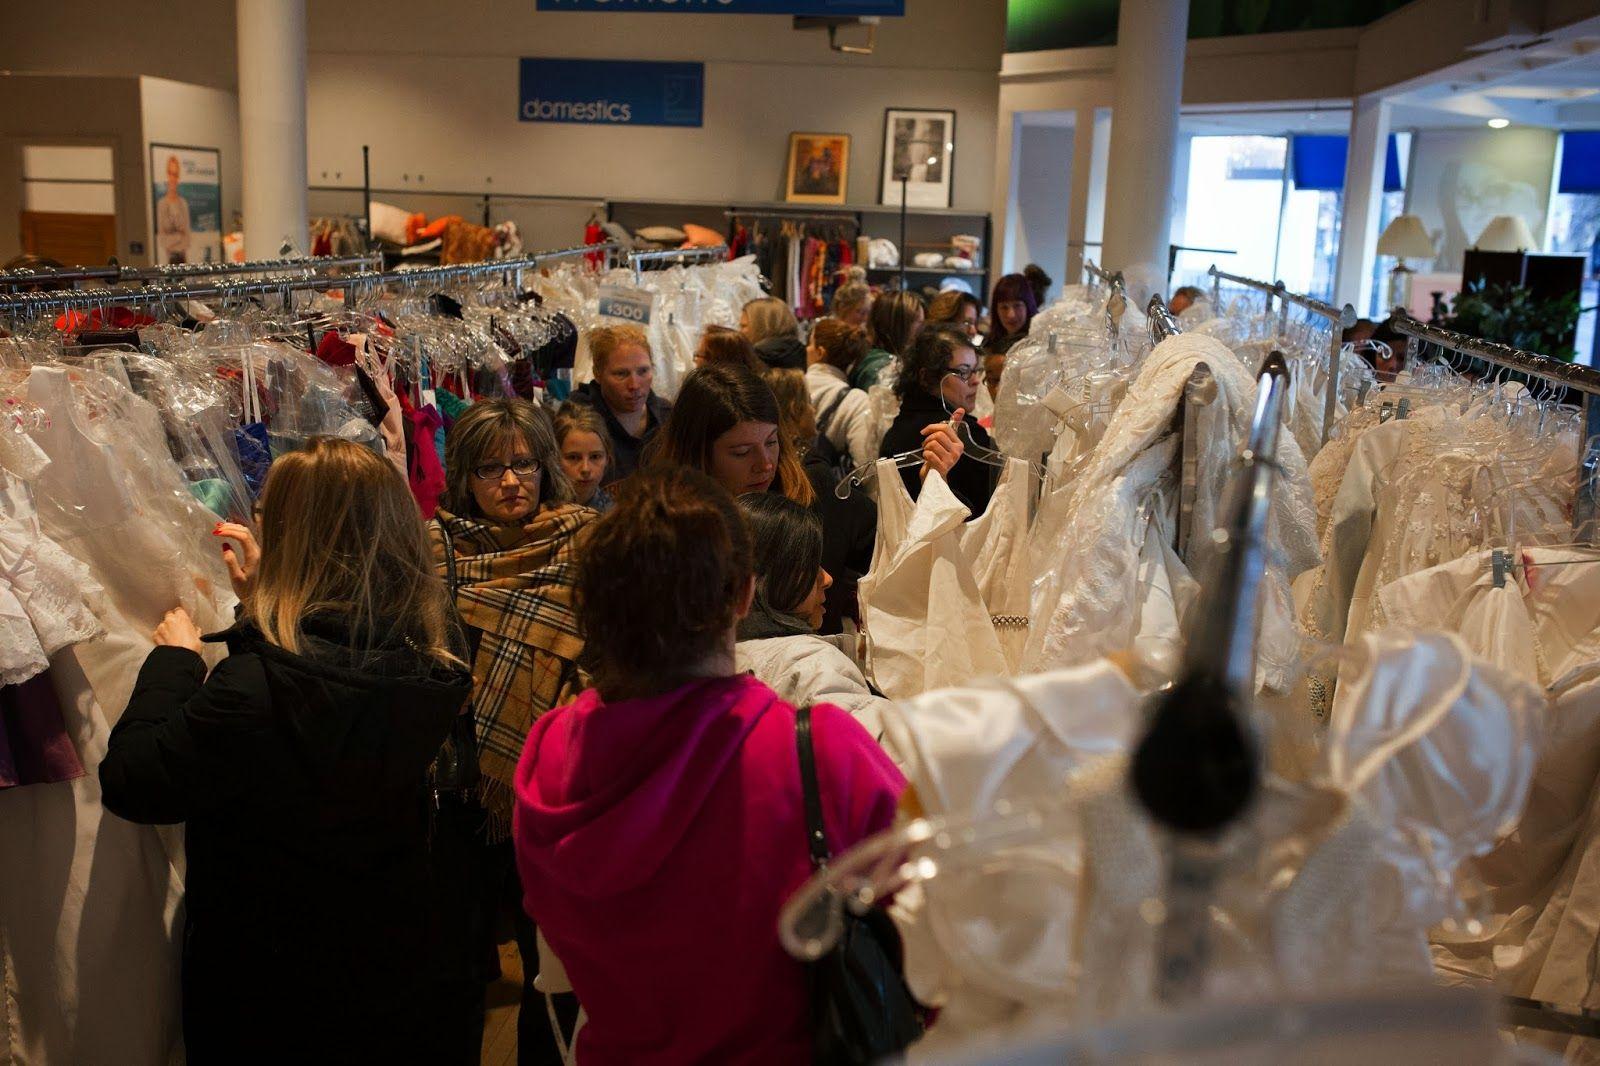 Goodwill industries of denver designer wedding gowns